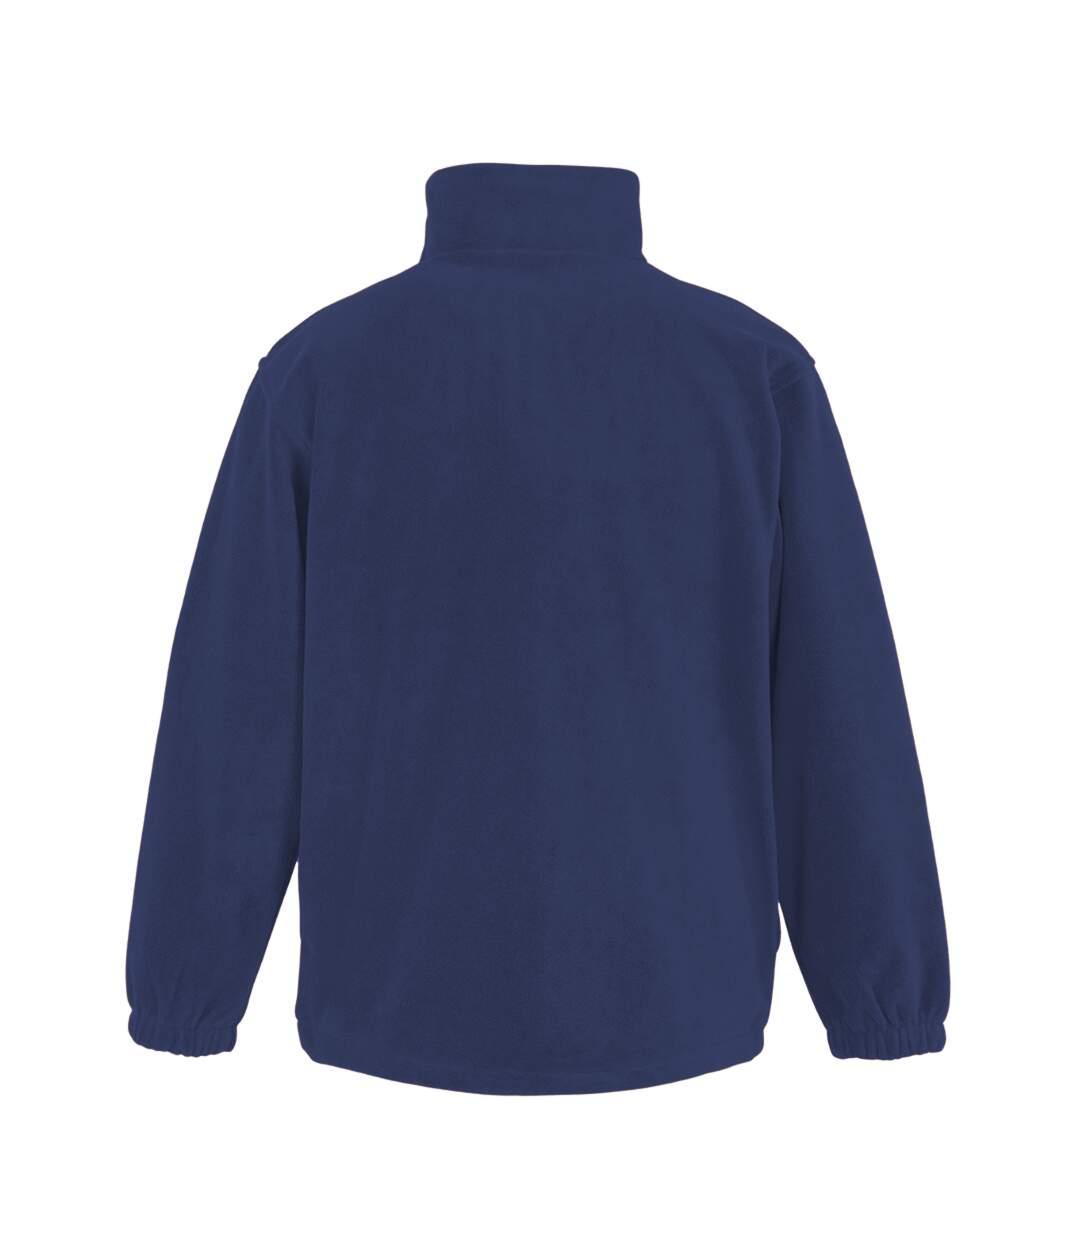 Result Mens Full Zip Active Fleece Anti Pilling Jacket (Navy Blue) - UTBC922